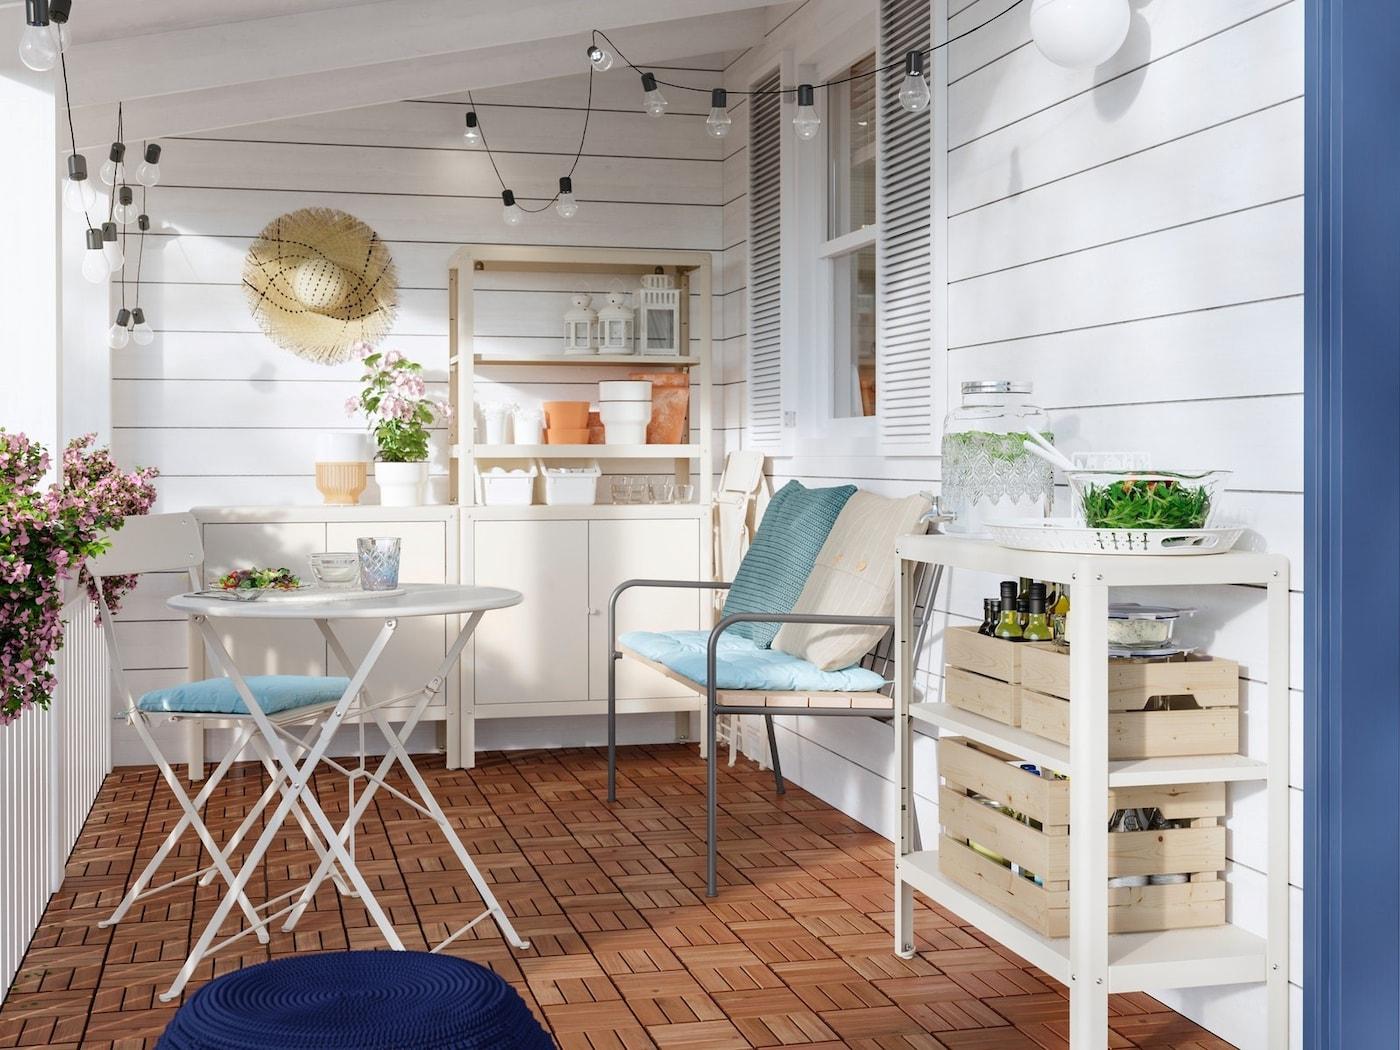 Outdoor Küche Ikea Family : Outdoor möbel balkonzubehör ikea